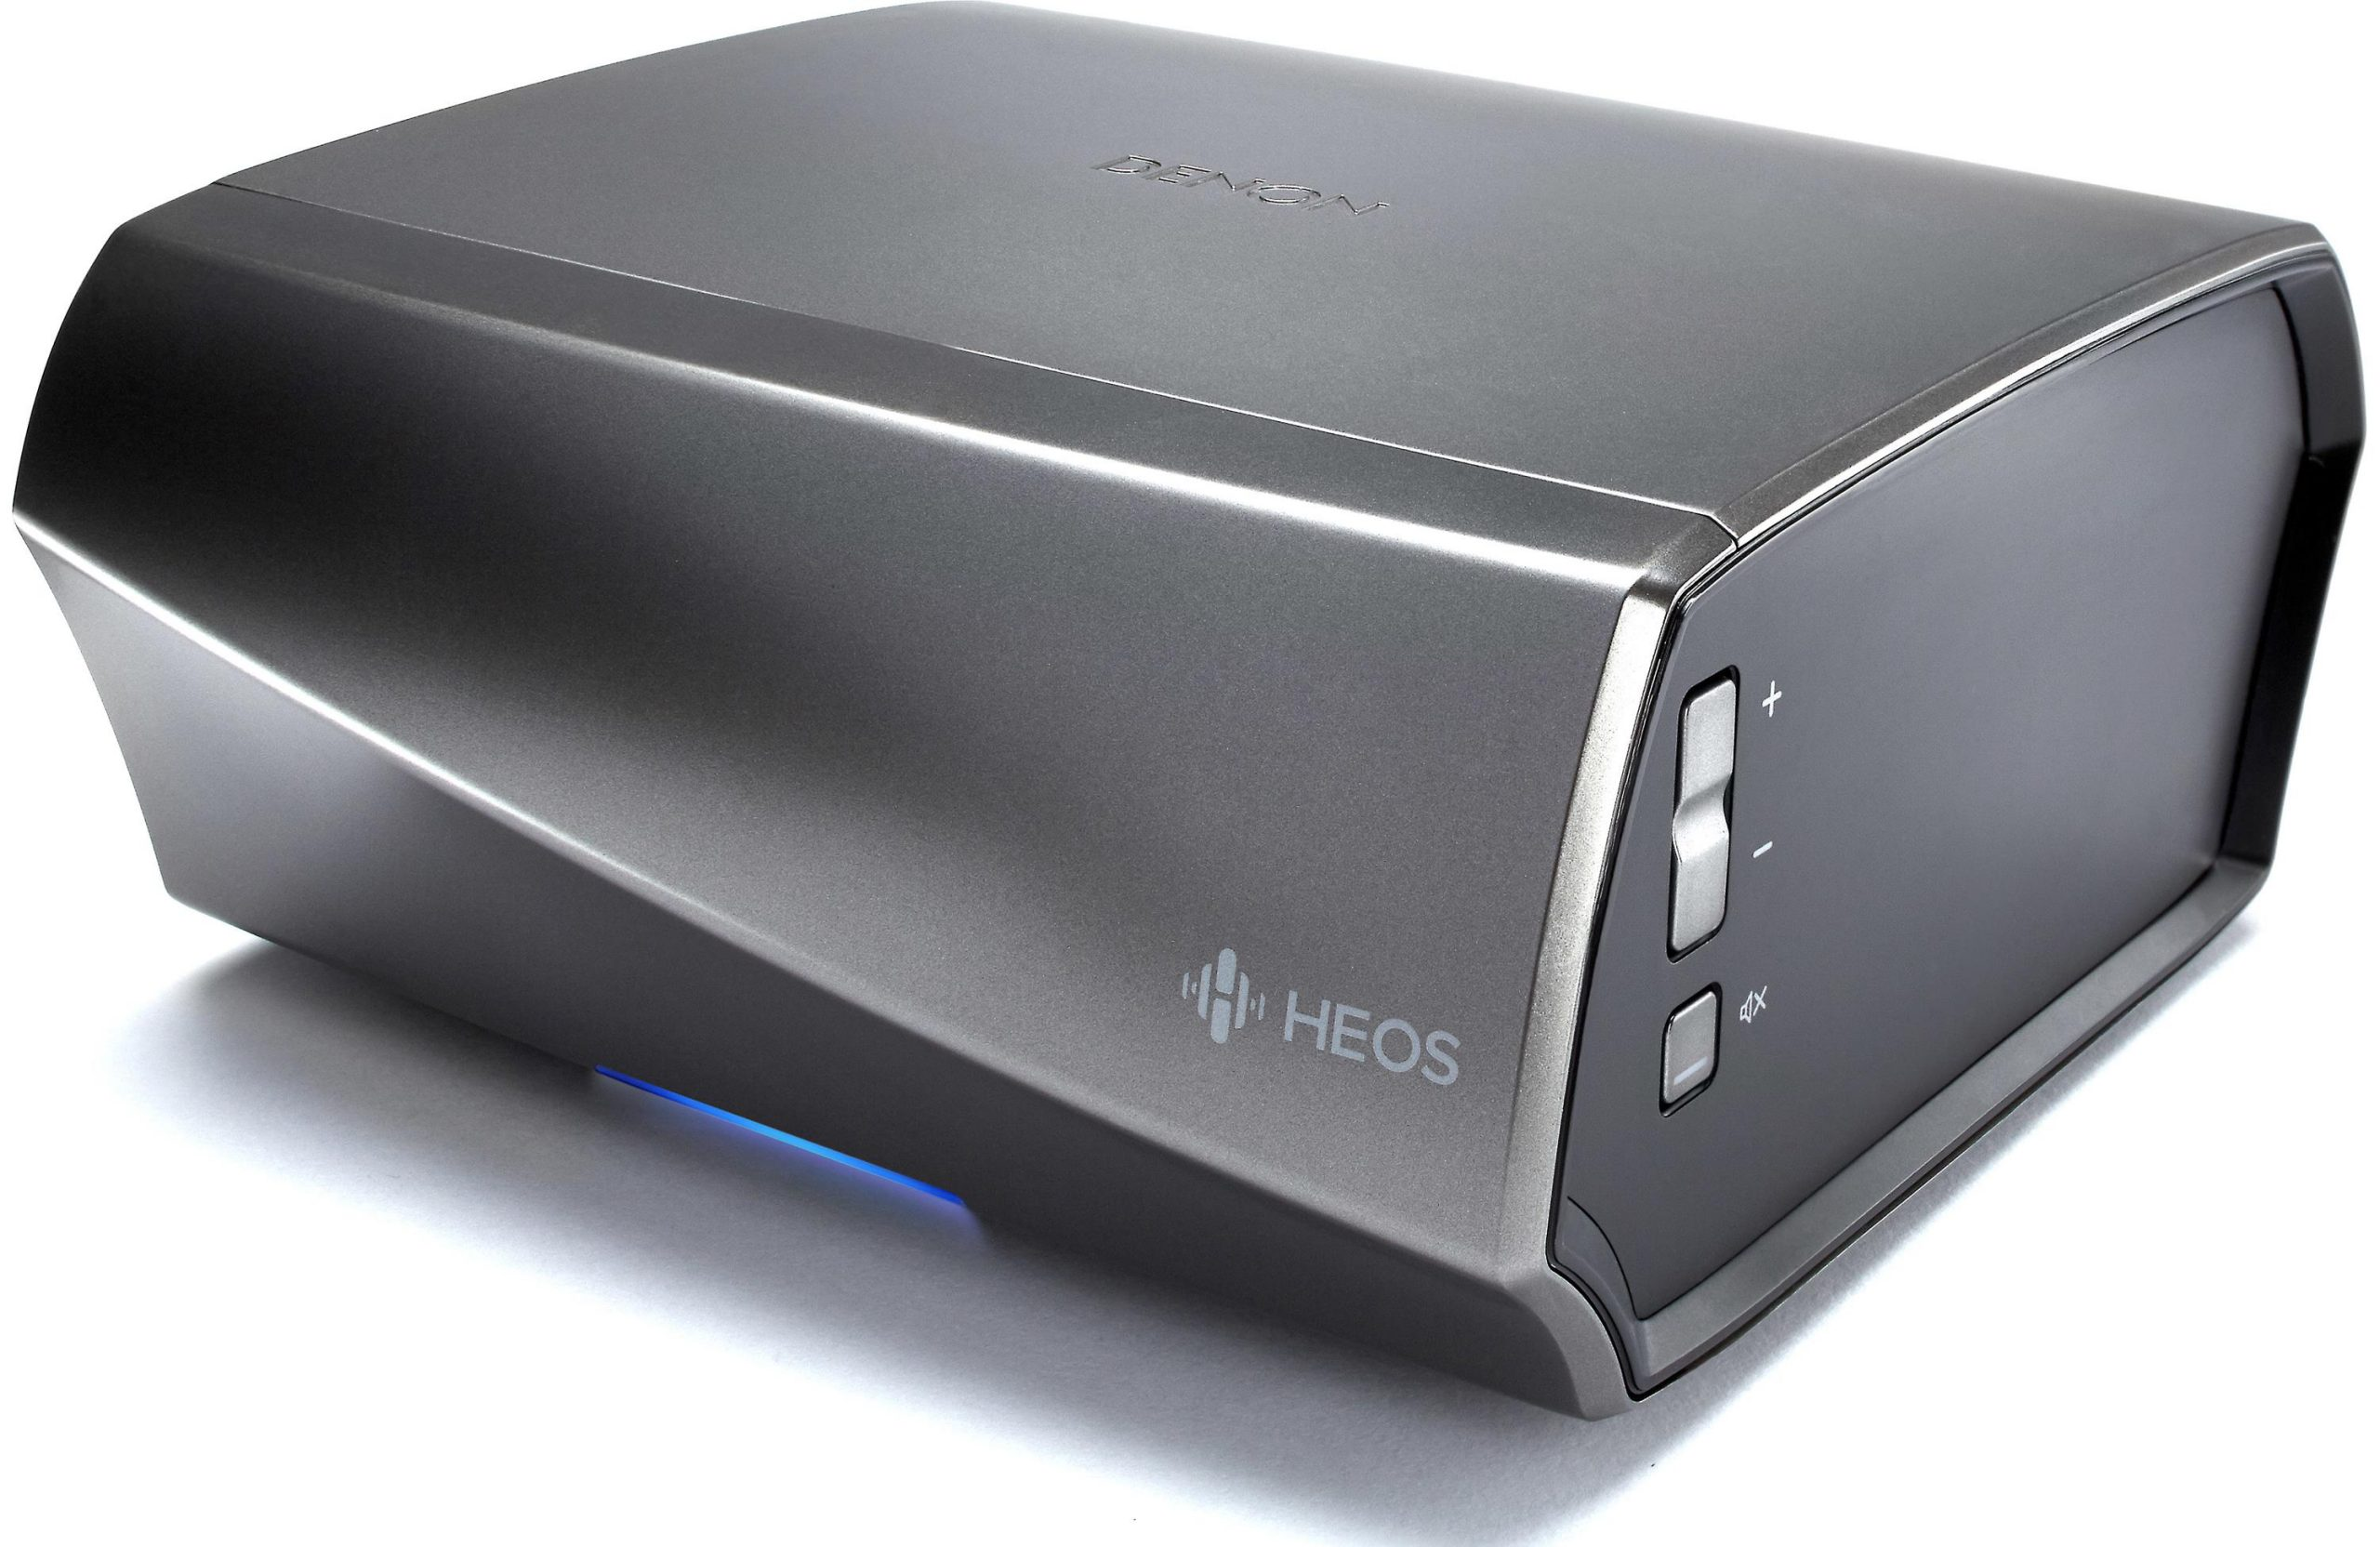 Denon HEOS Link Price in India